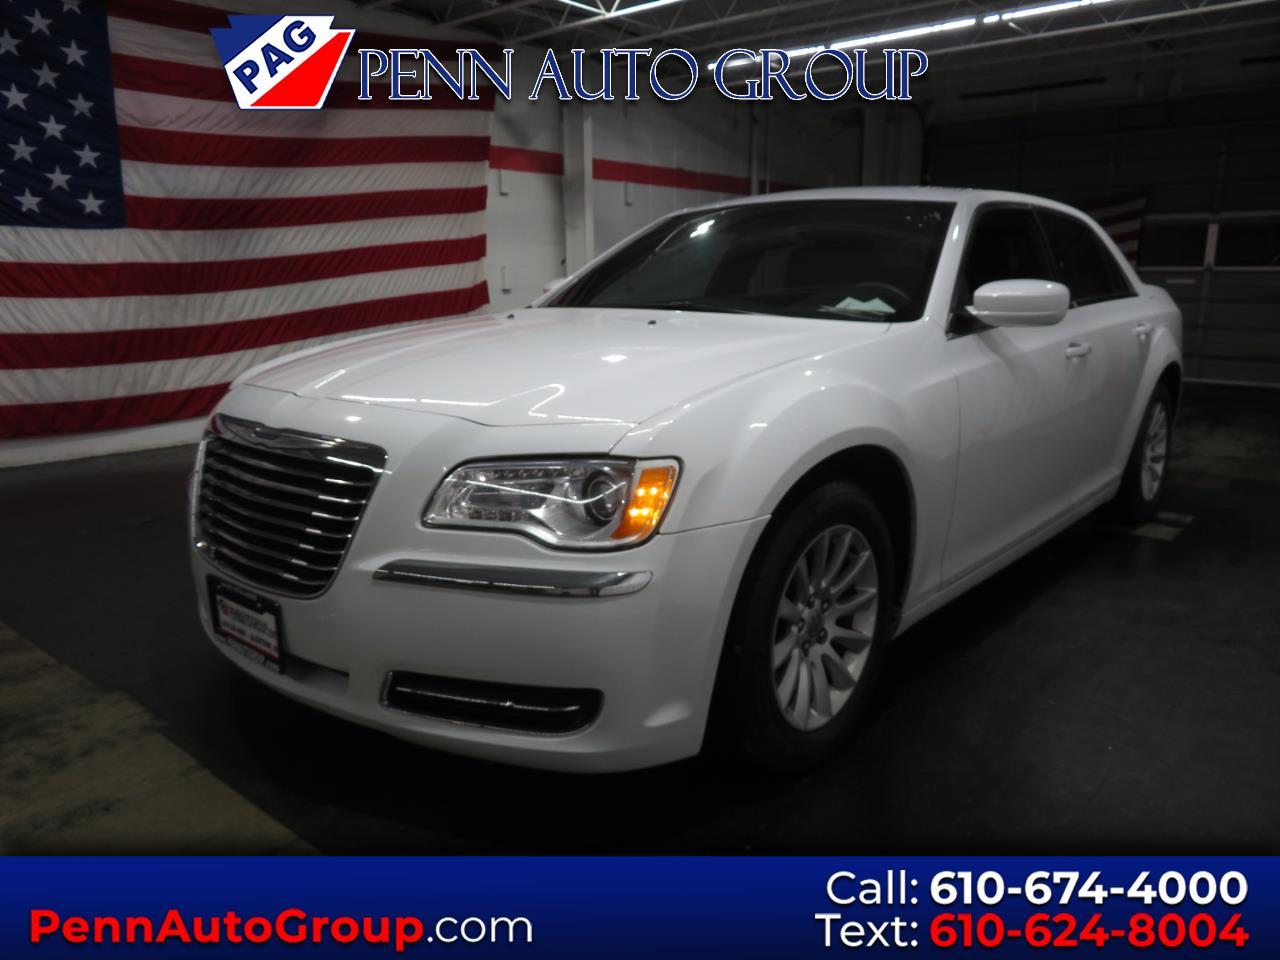 2012 Chrysler 300 4dr Sdn 300 RWD